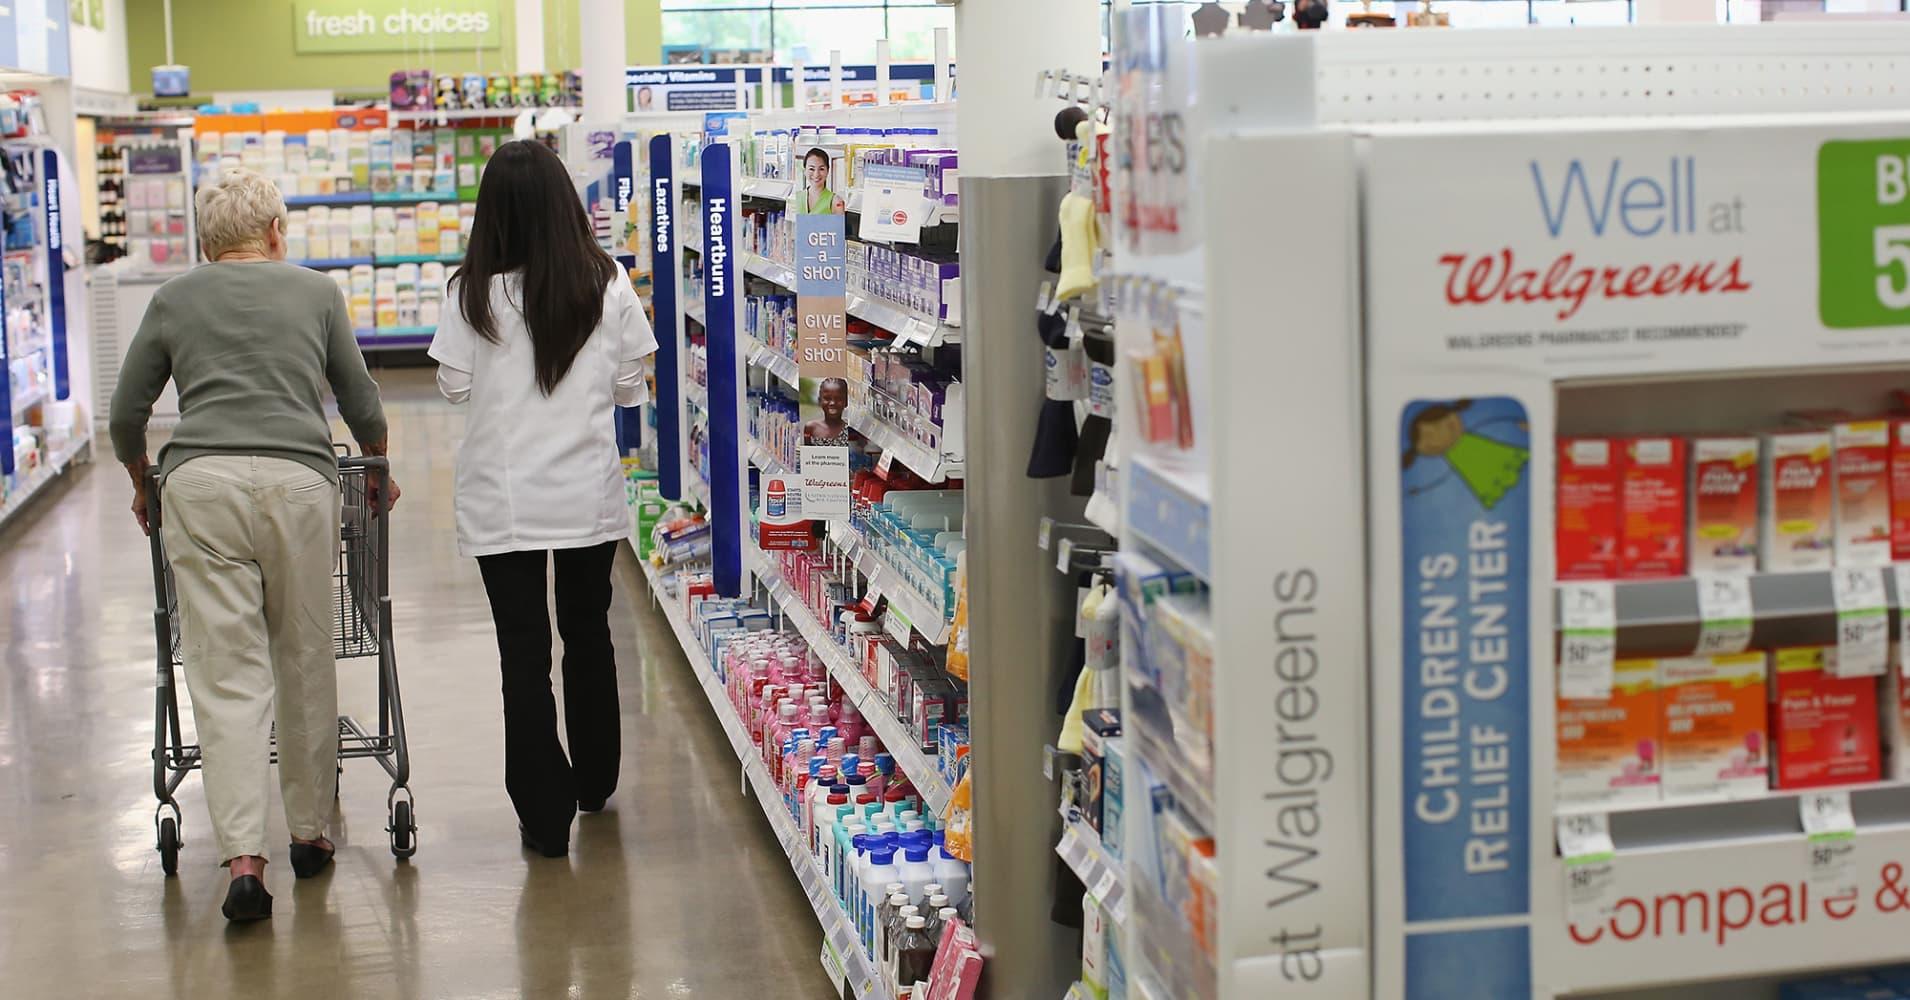 Walgreens Boots Alliance's plans $1 billion in cuts, stock drops